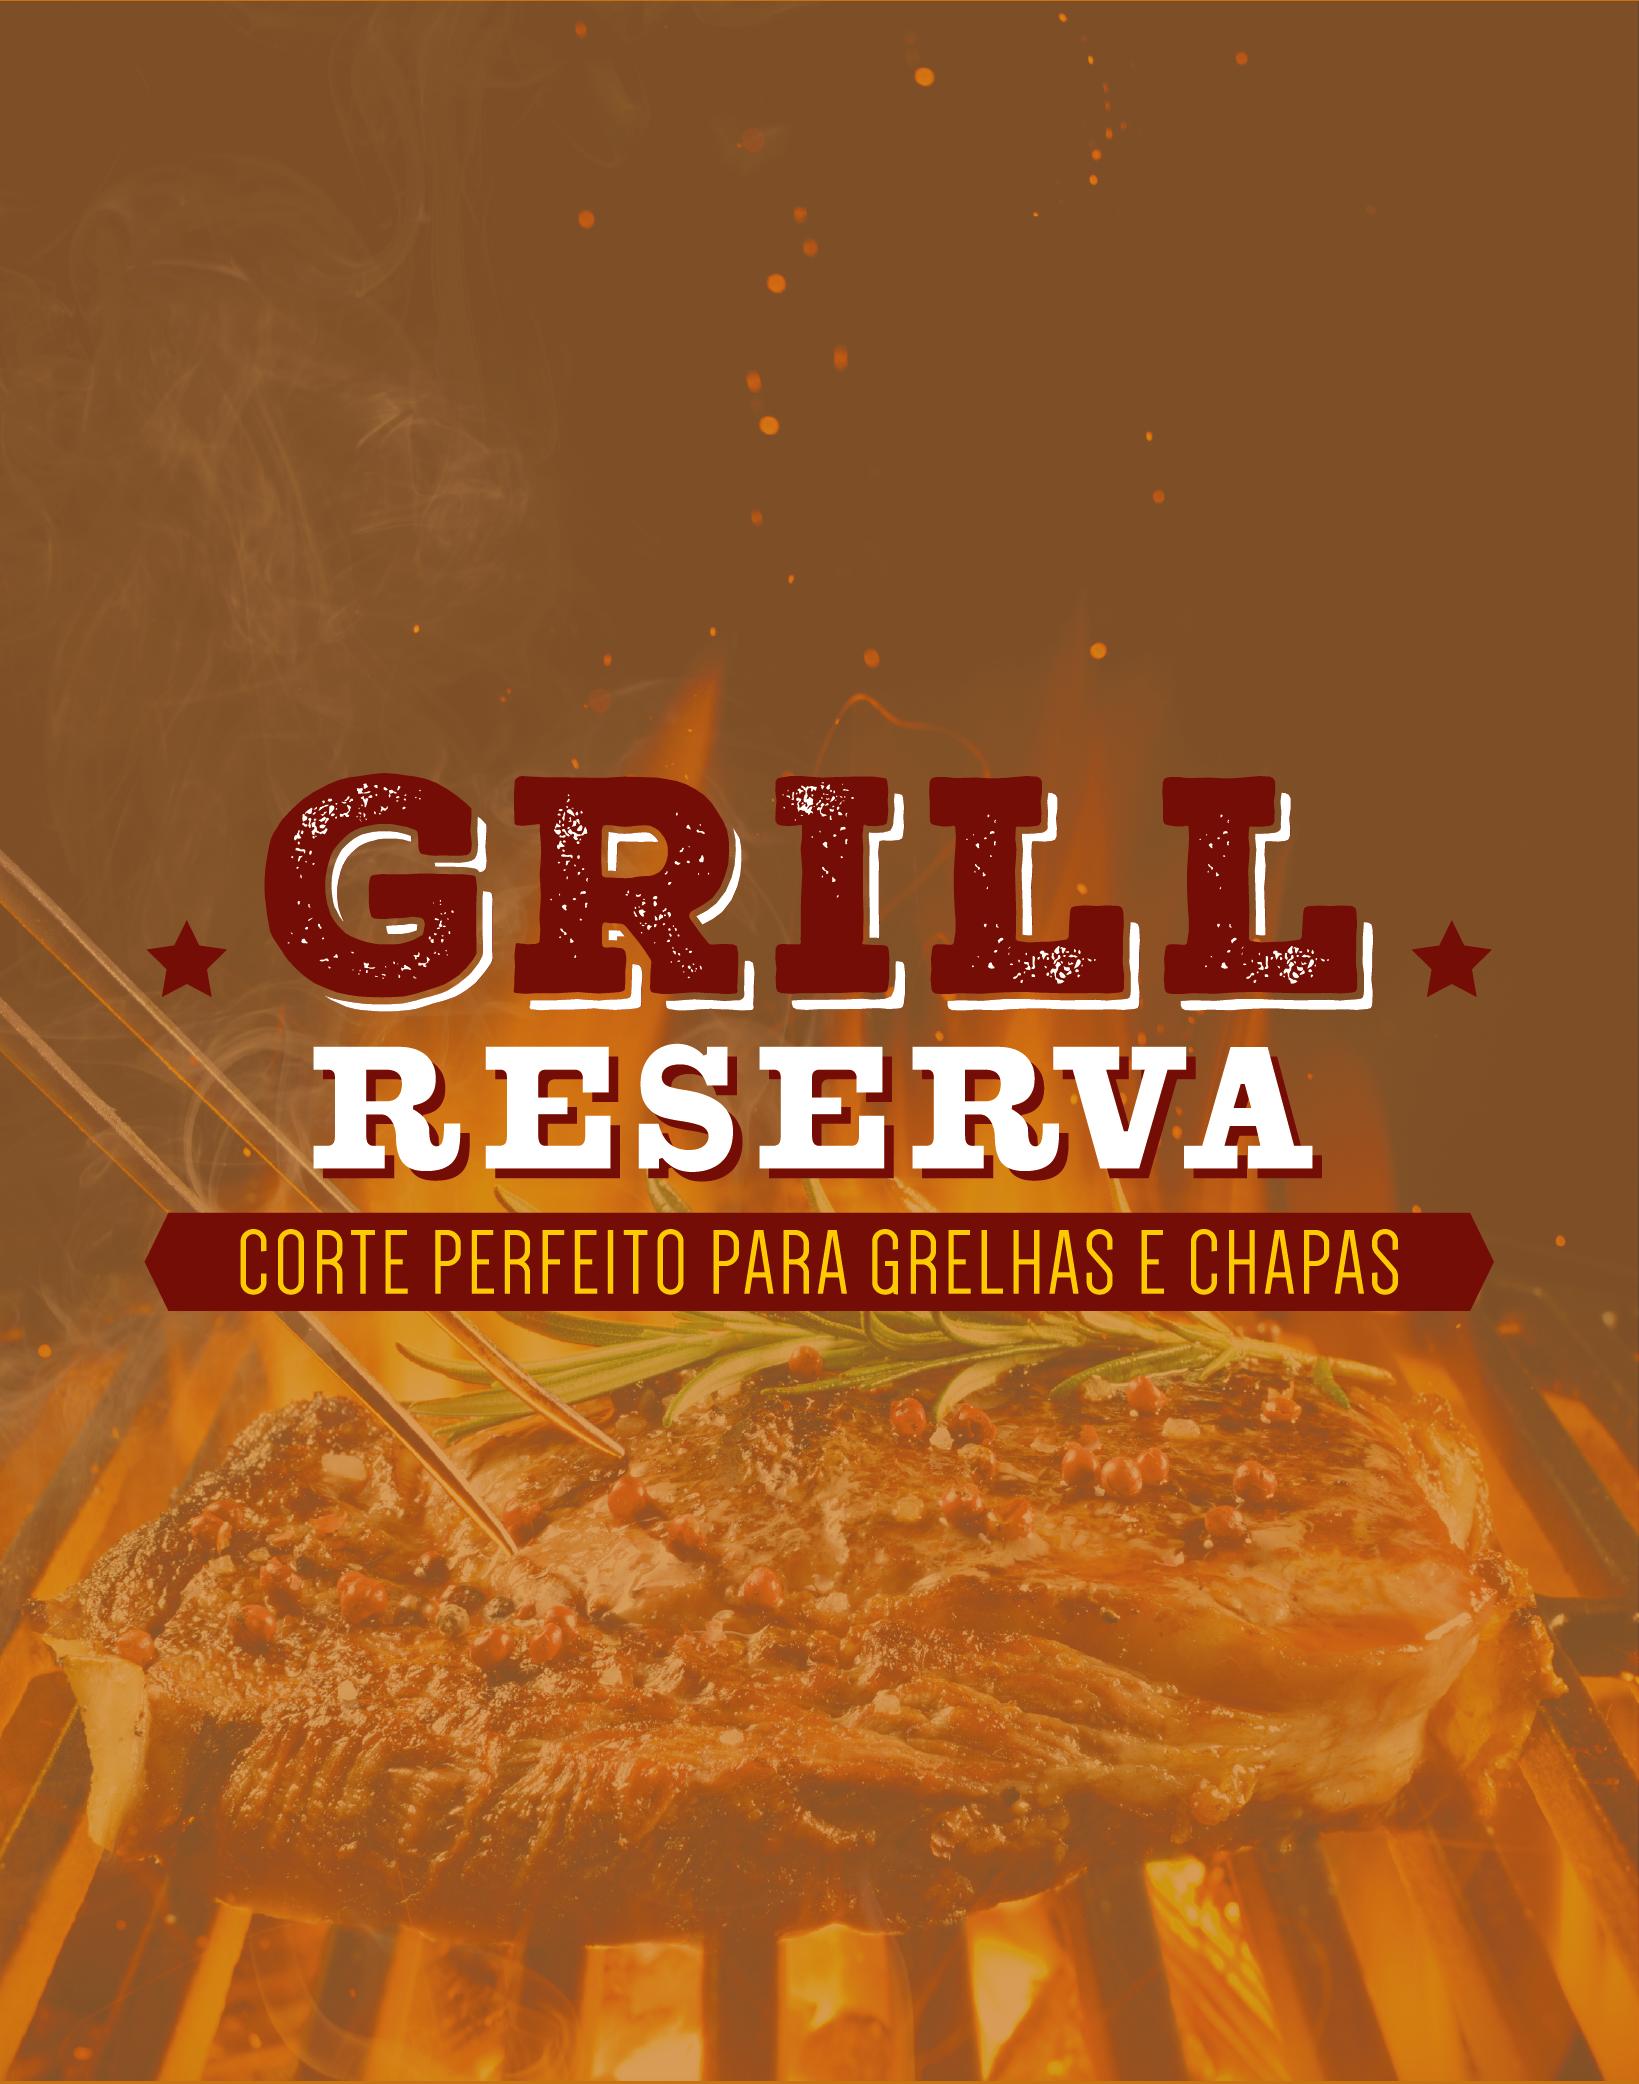 Grill_botão_Prancheta 1 cópia